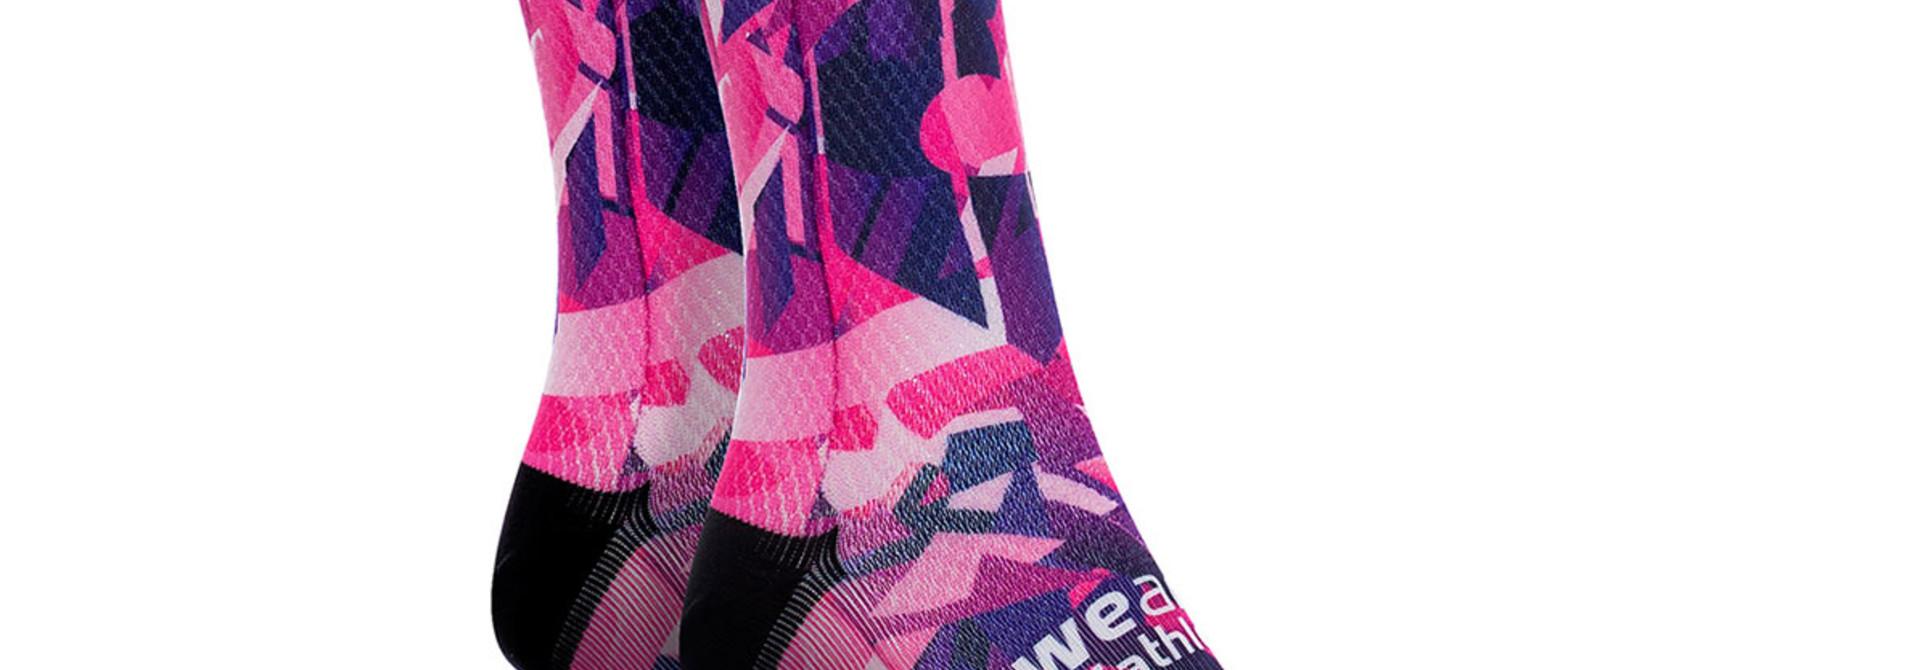 Performance Socks Colour Explosion